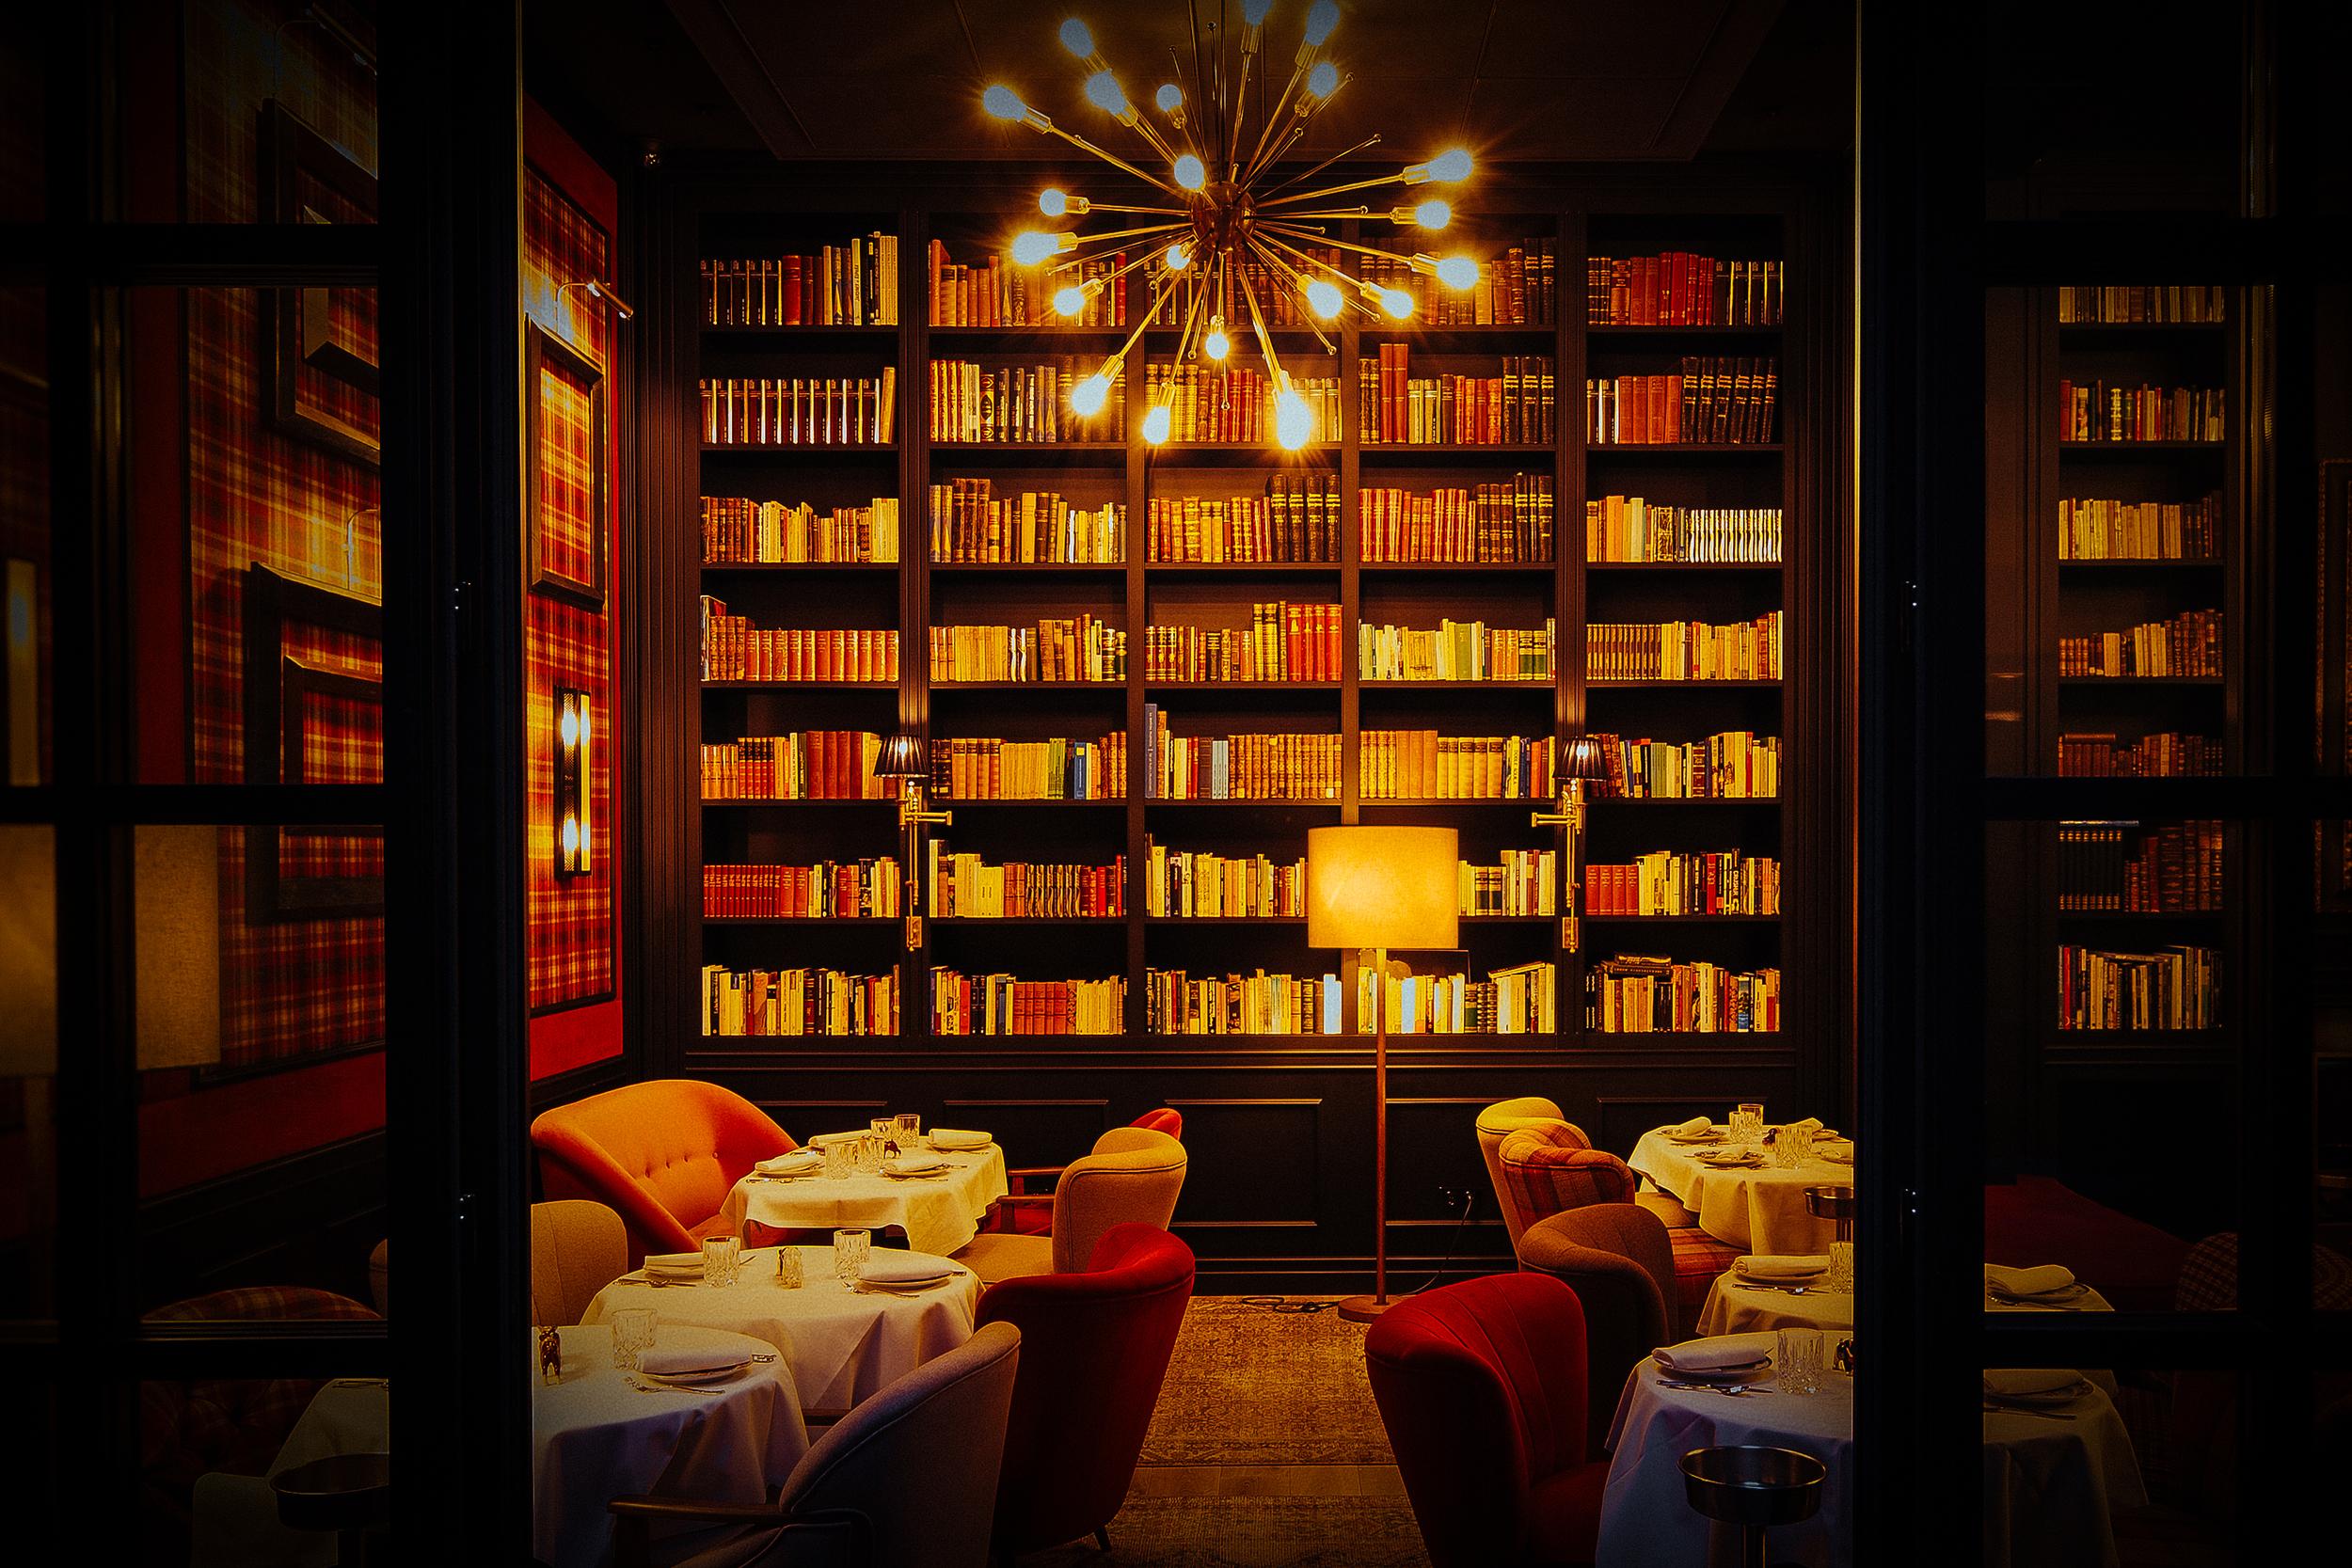 Witty Restaurant, Barcelona